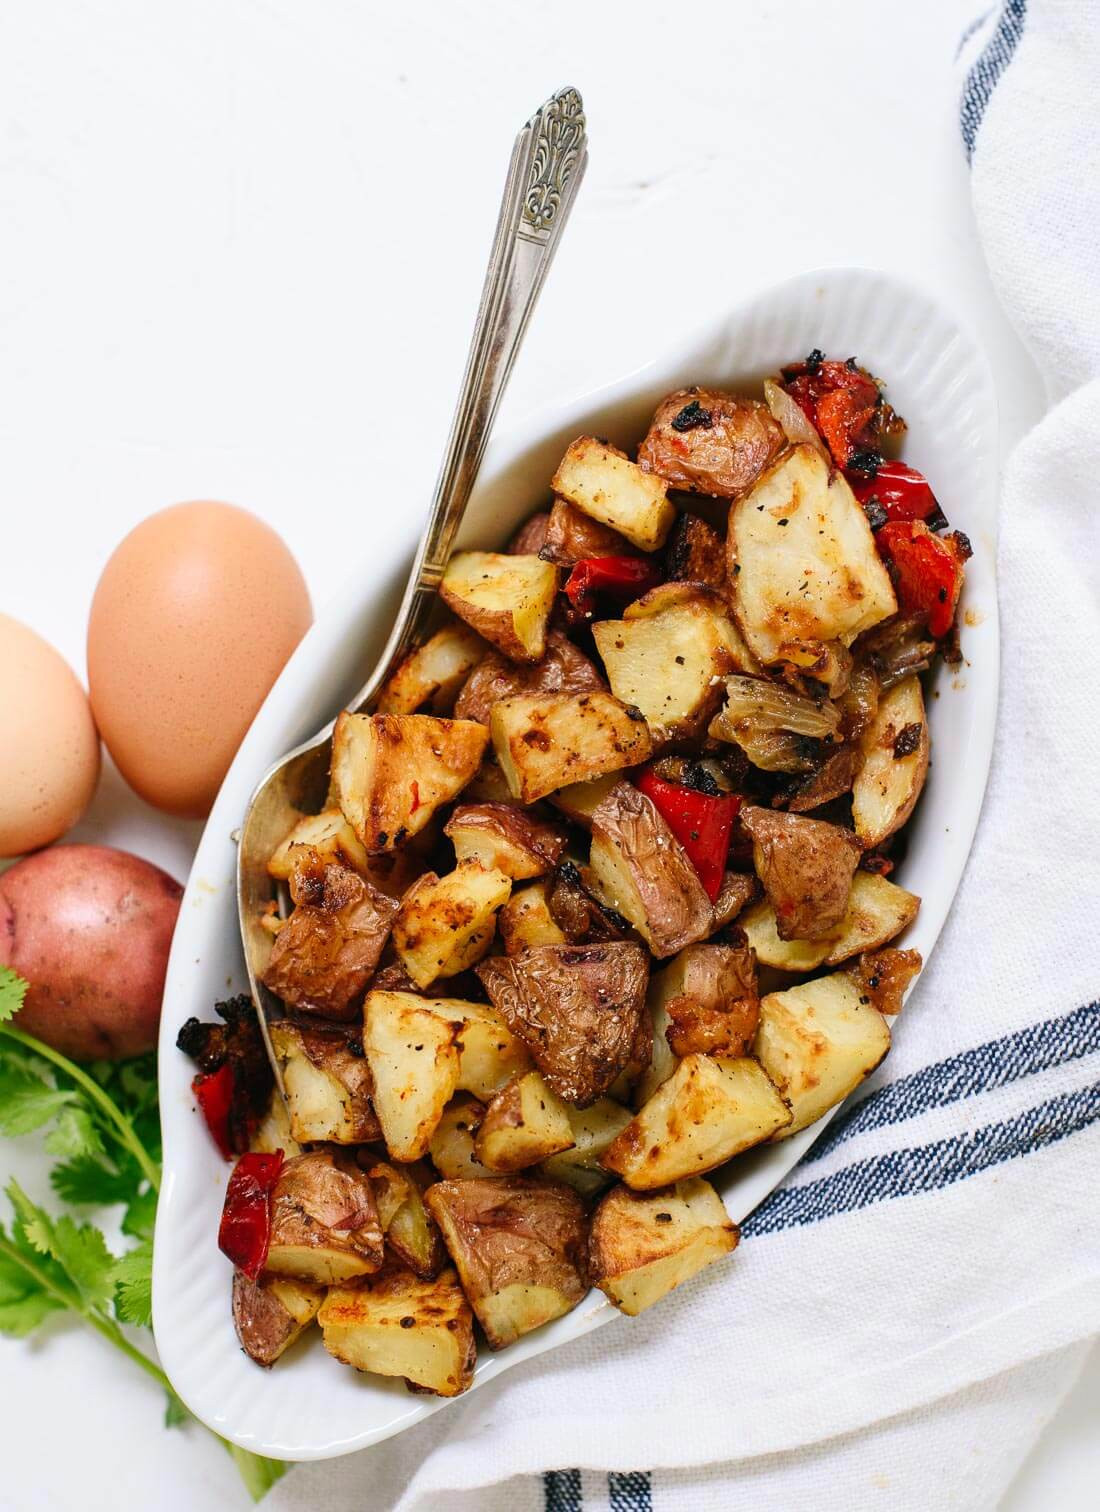 Breakfast Red Potatoes  Roasted Breakfast Potatoes Home Fries Cookie and Kate